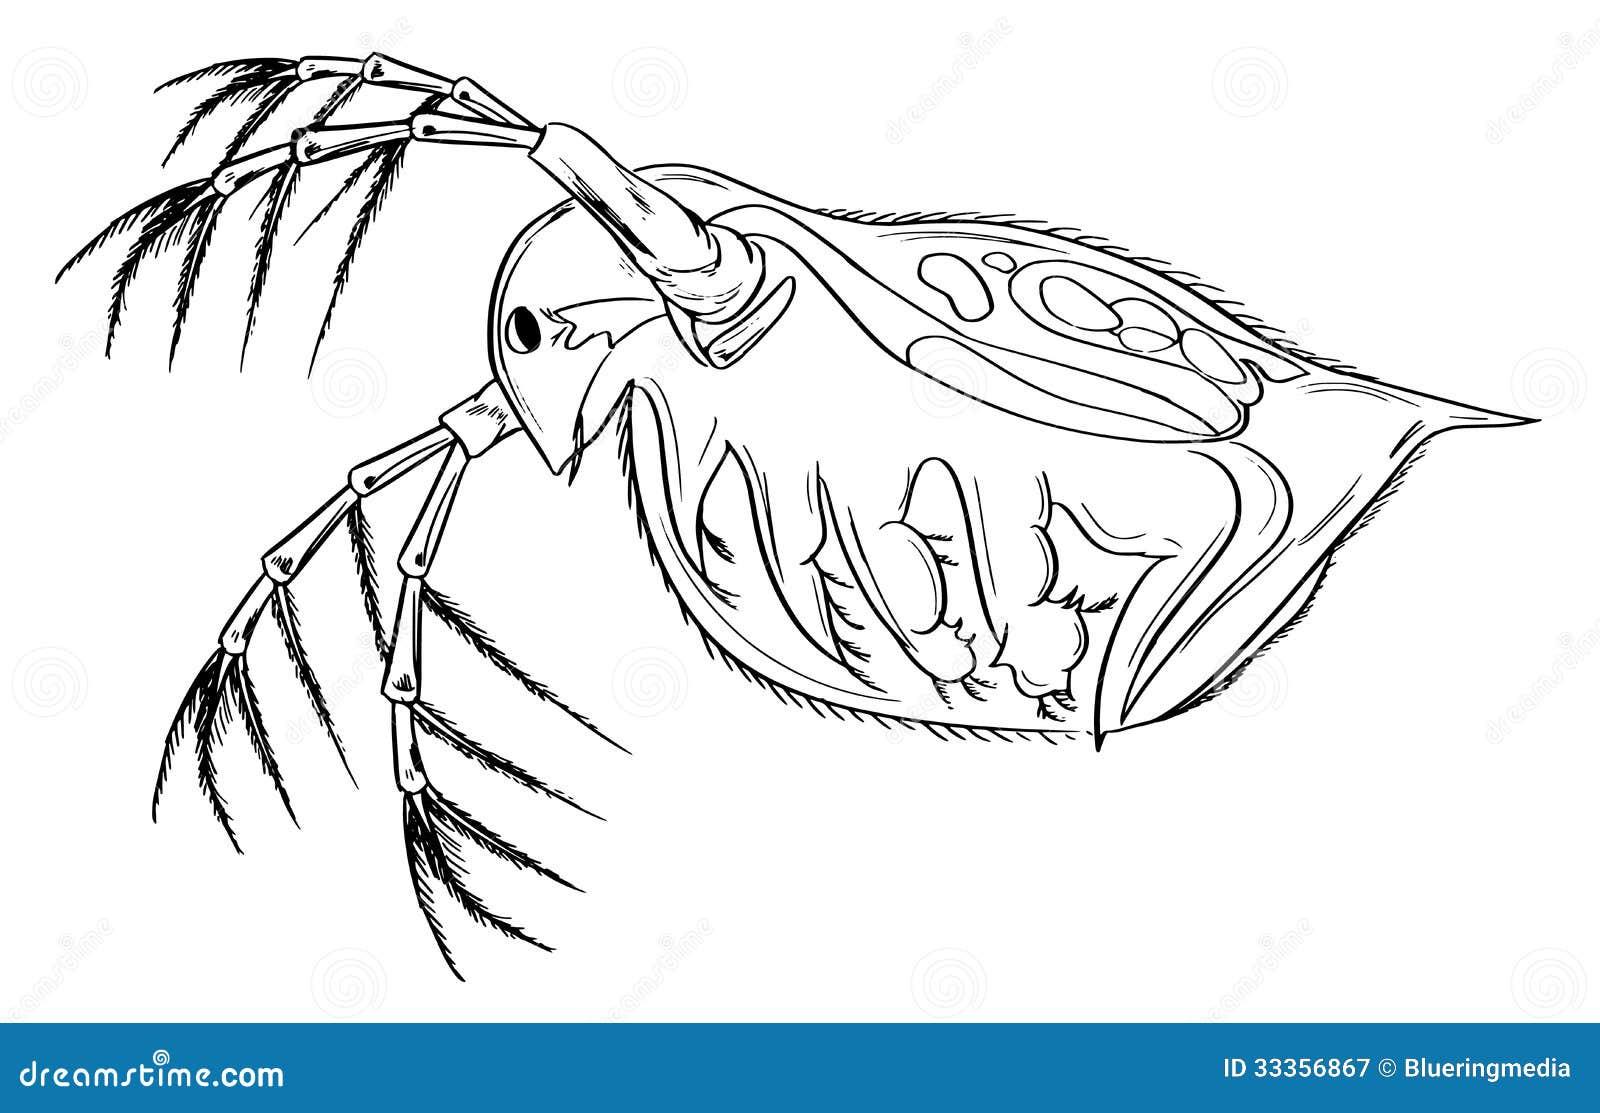 Zooplankton Clipart